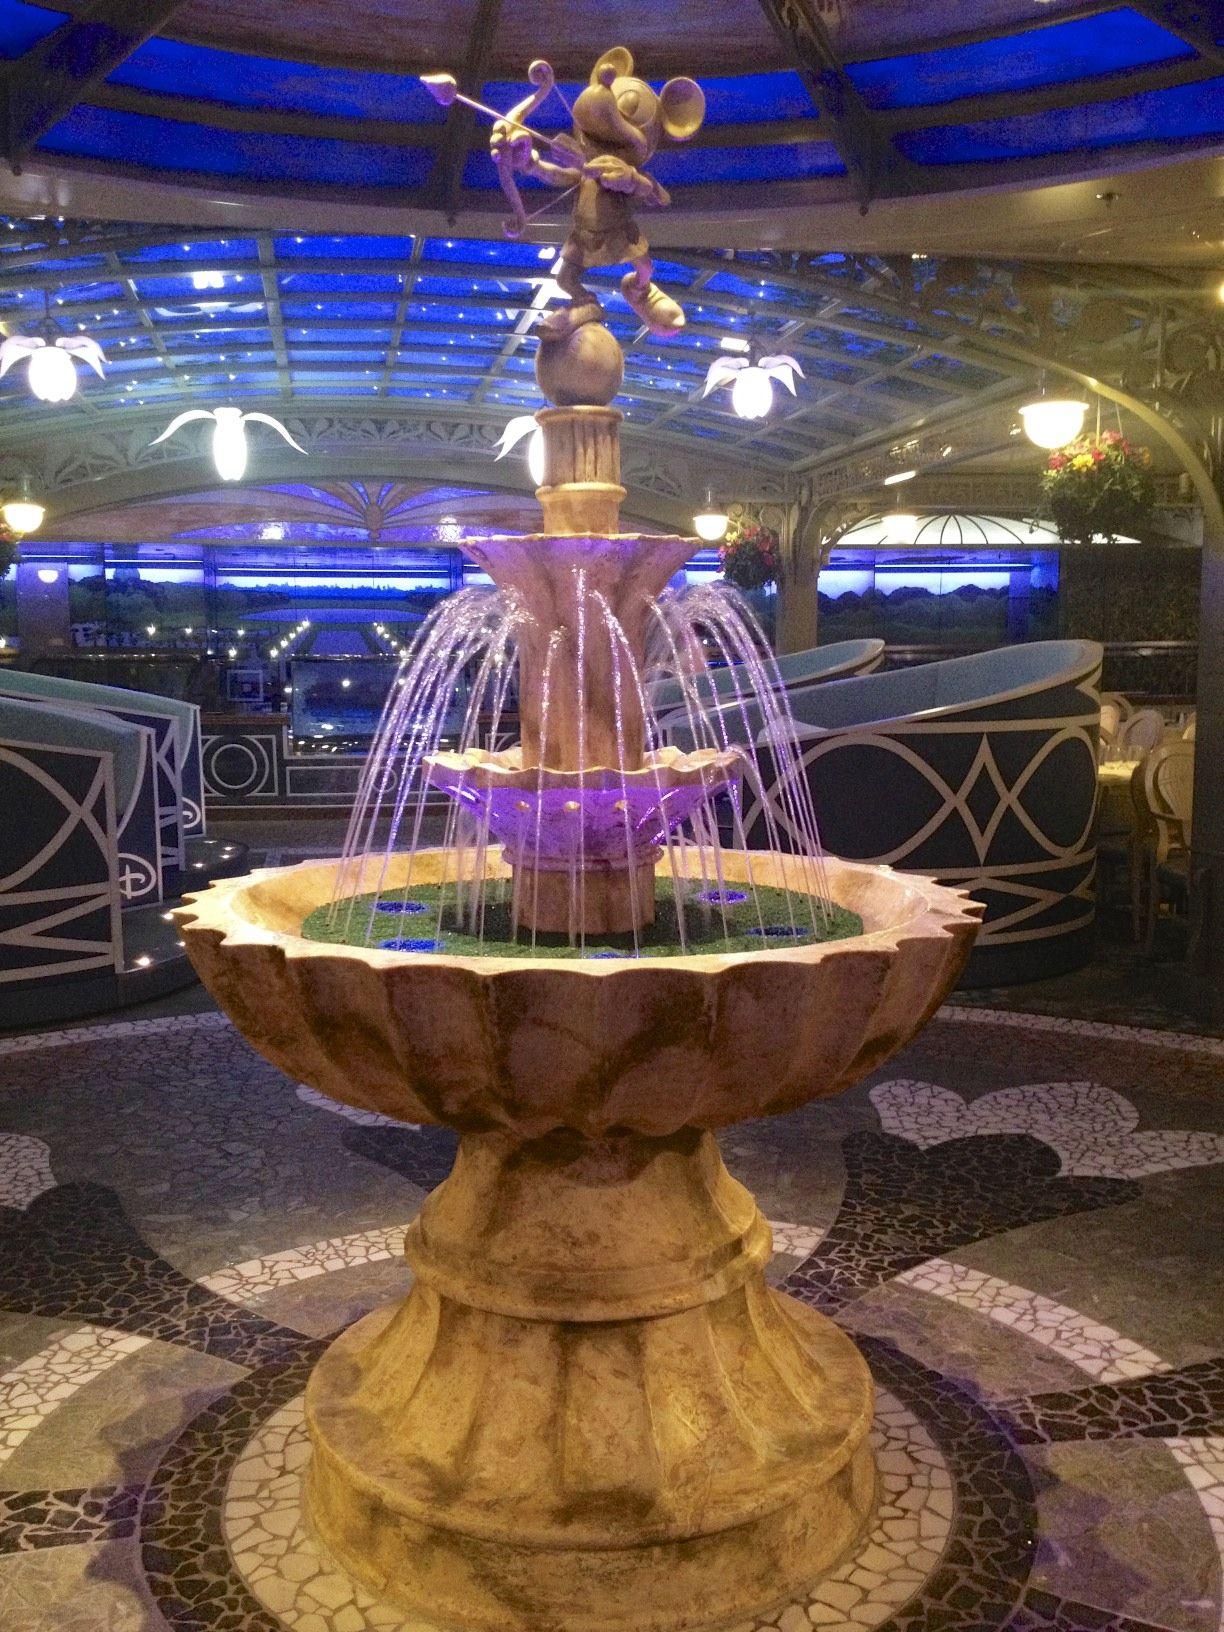 Enchanted Garden restaurant aboard the Disney Dream cruise